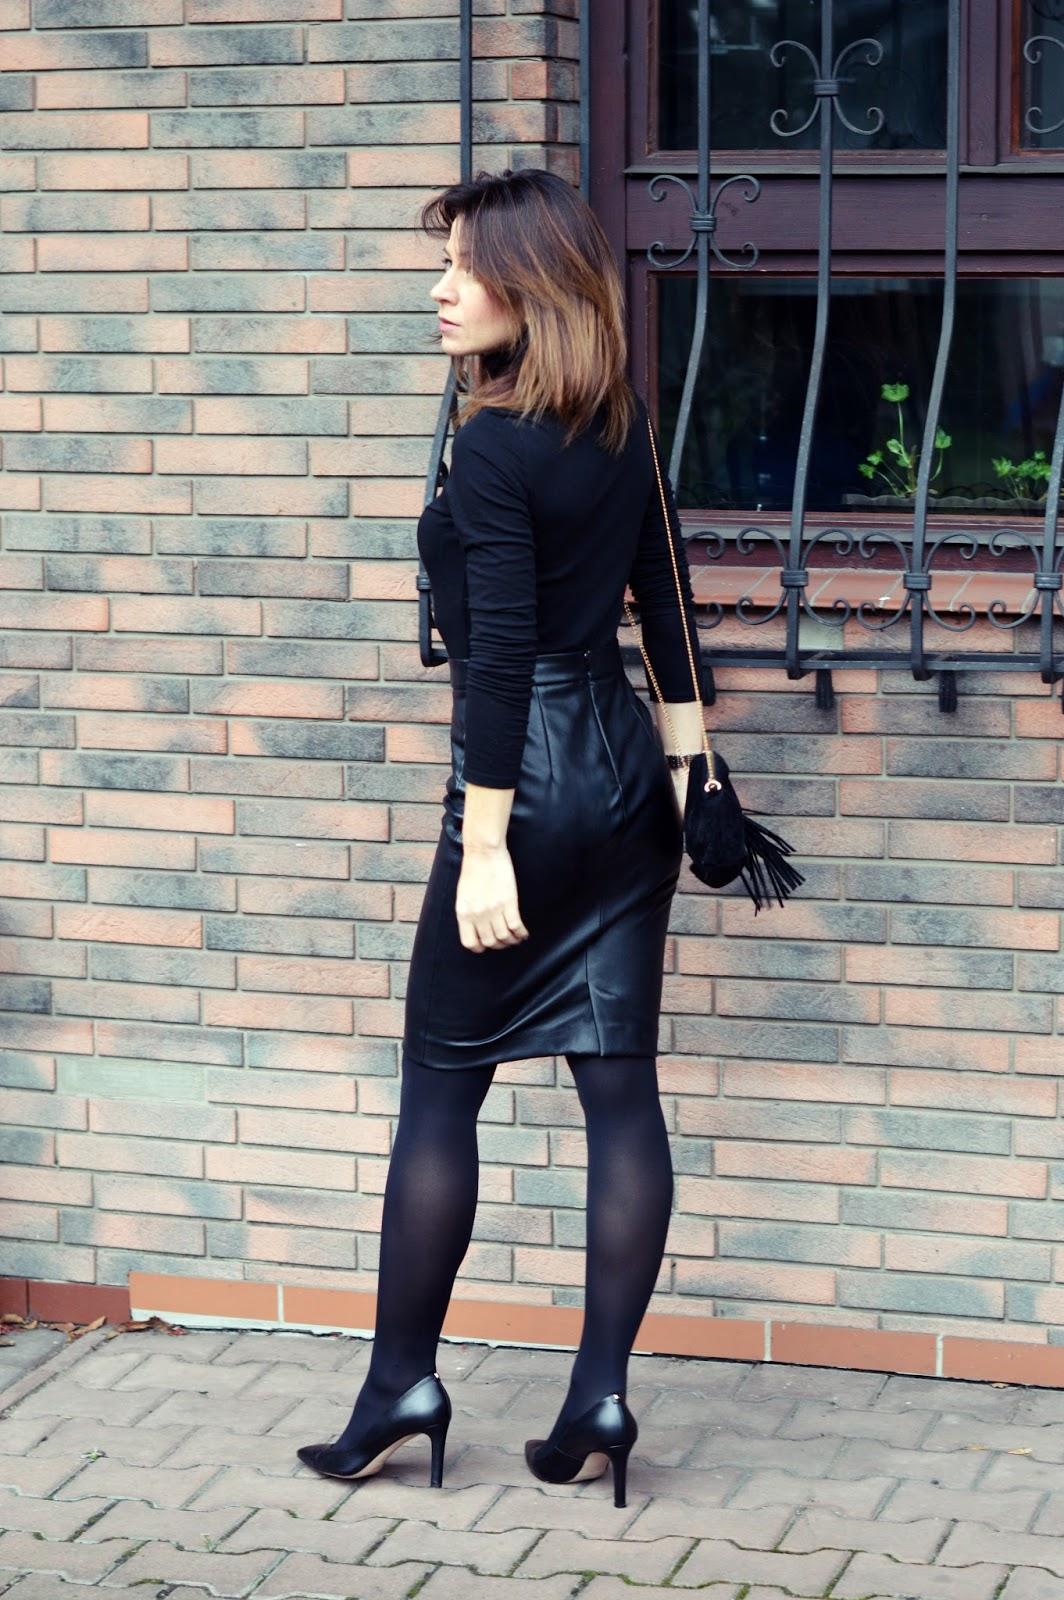 Sexy Black Stockings Pics